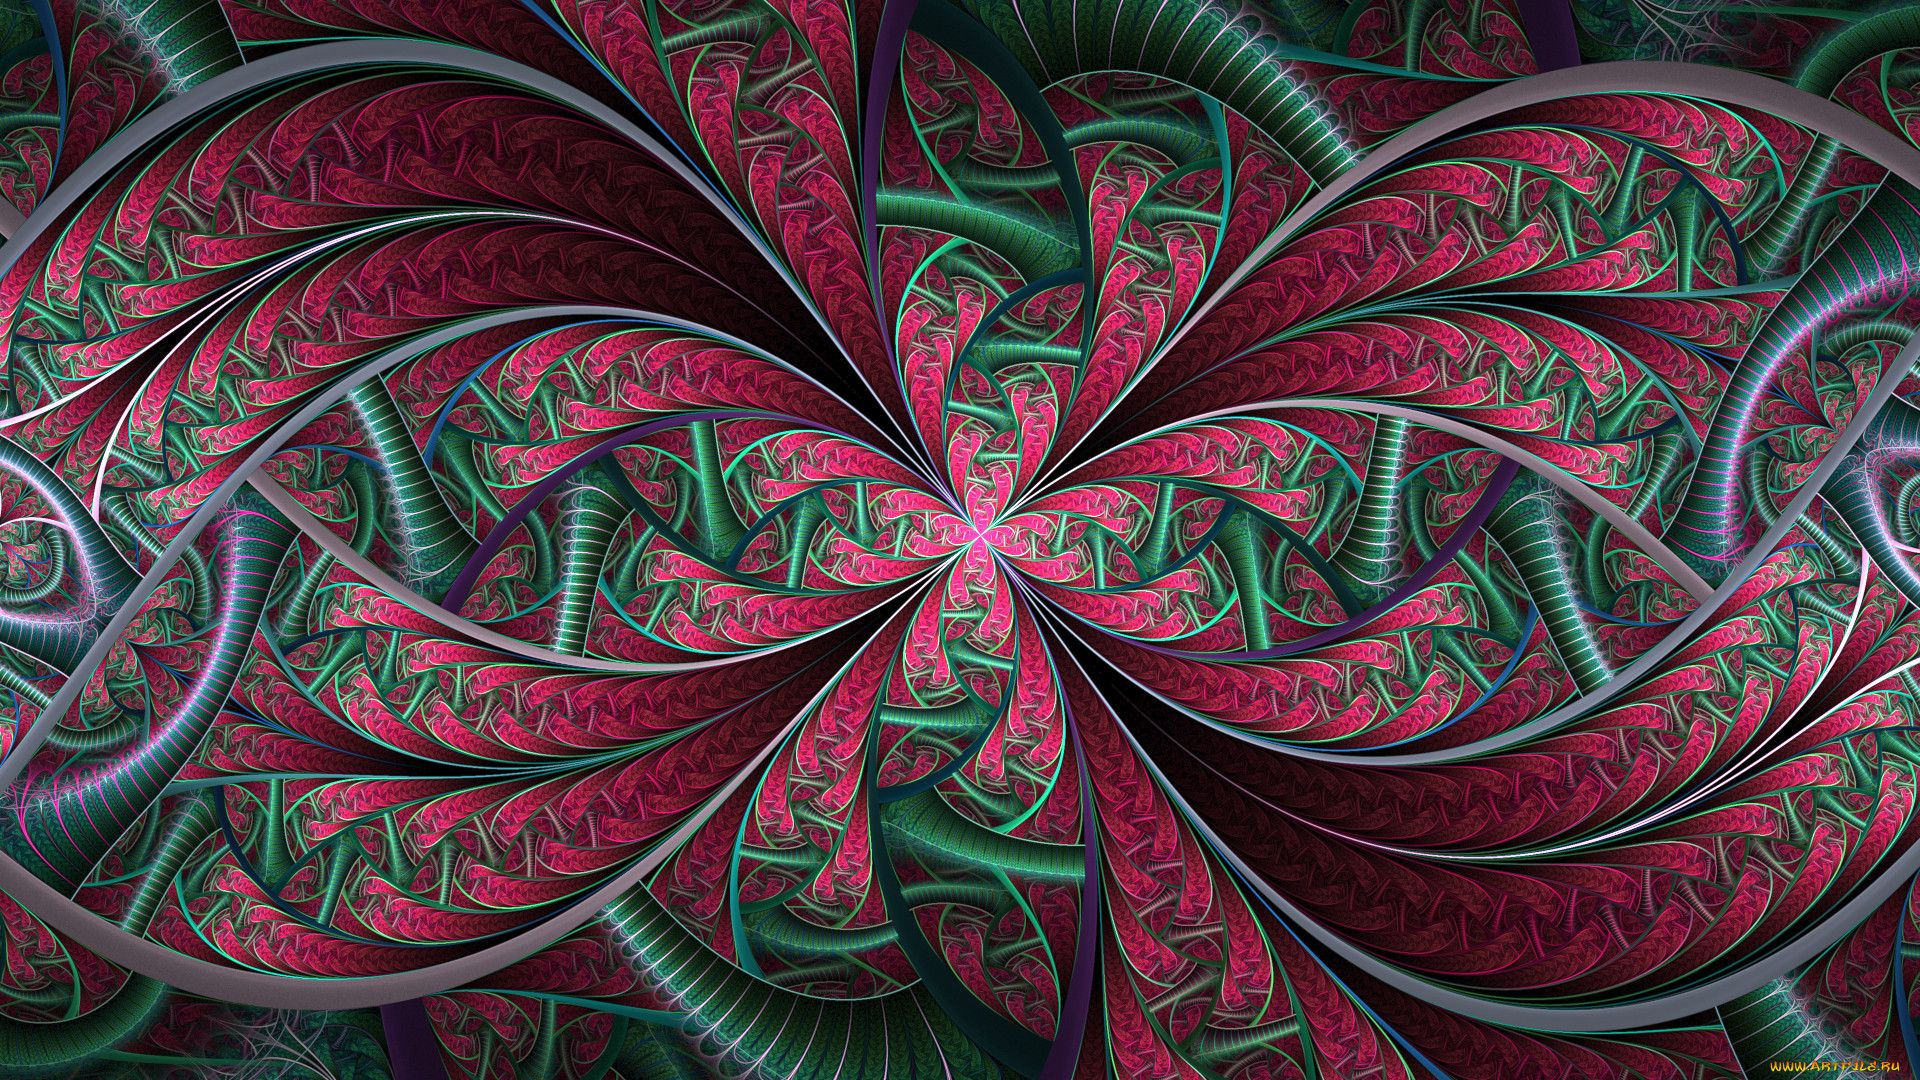 Kaleidoscope wallpaper image